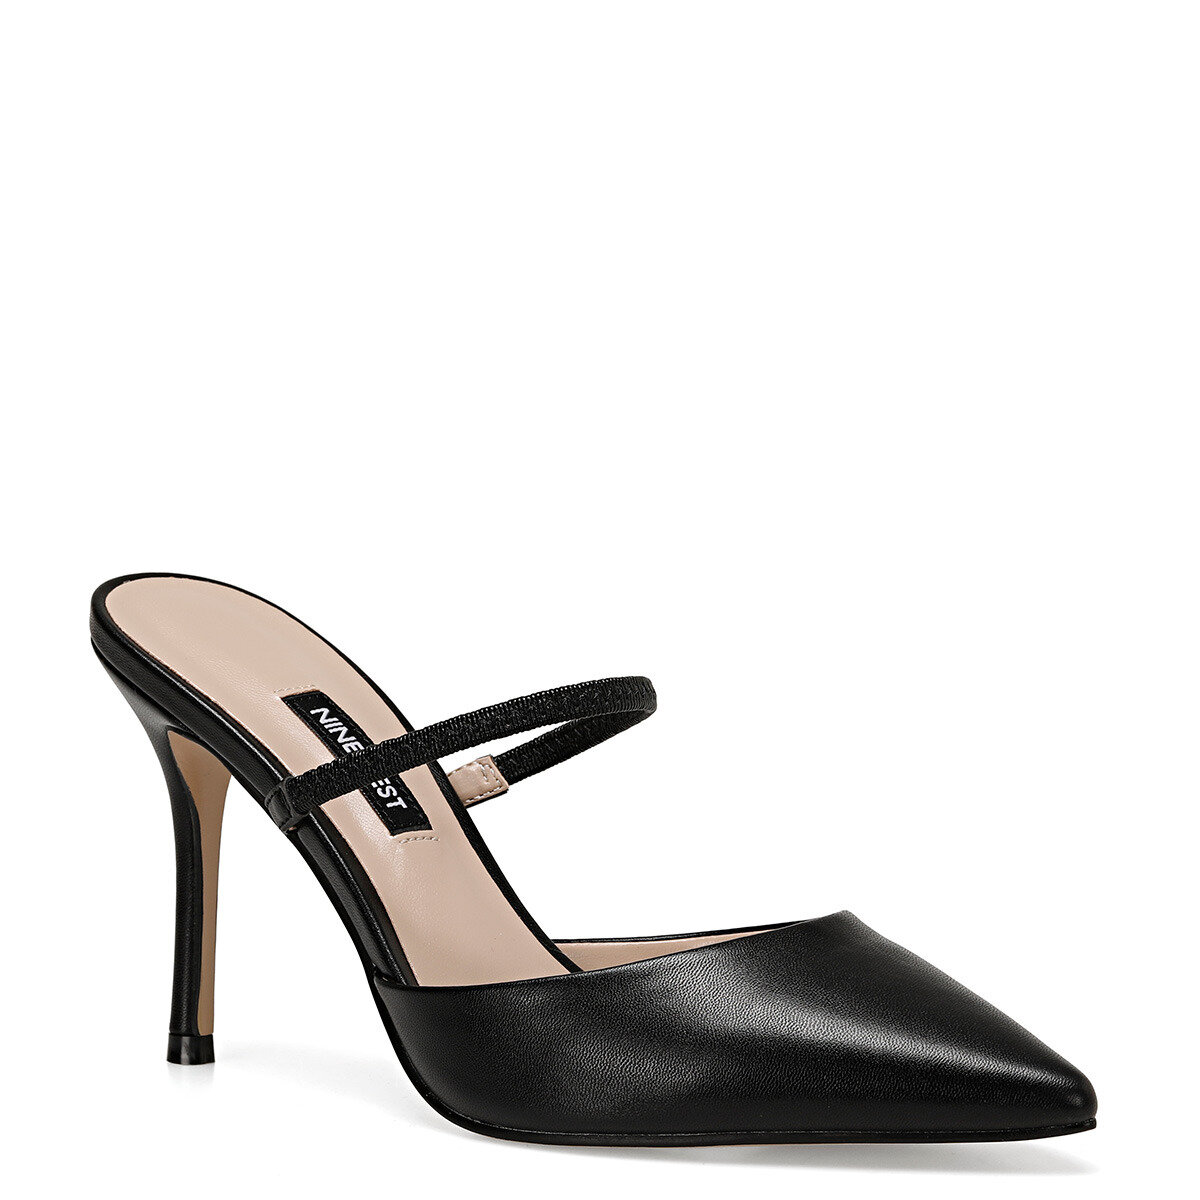 TIGO Siyah Kadın Stiletto